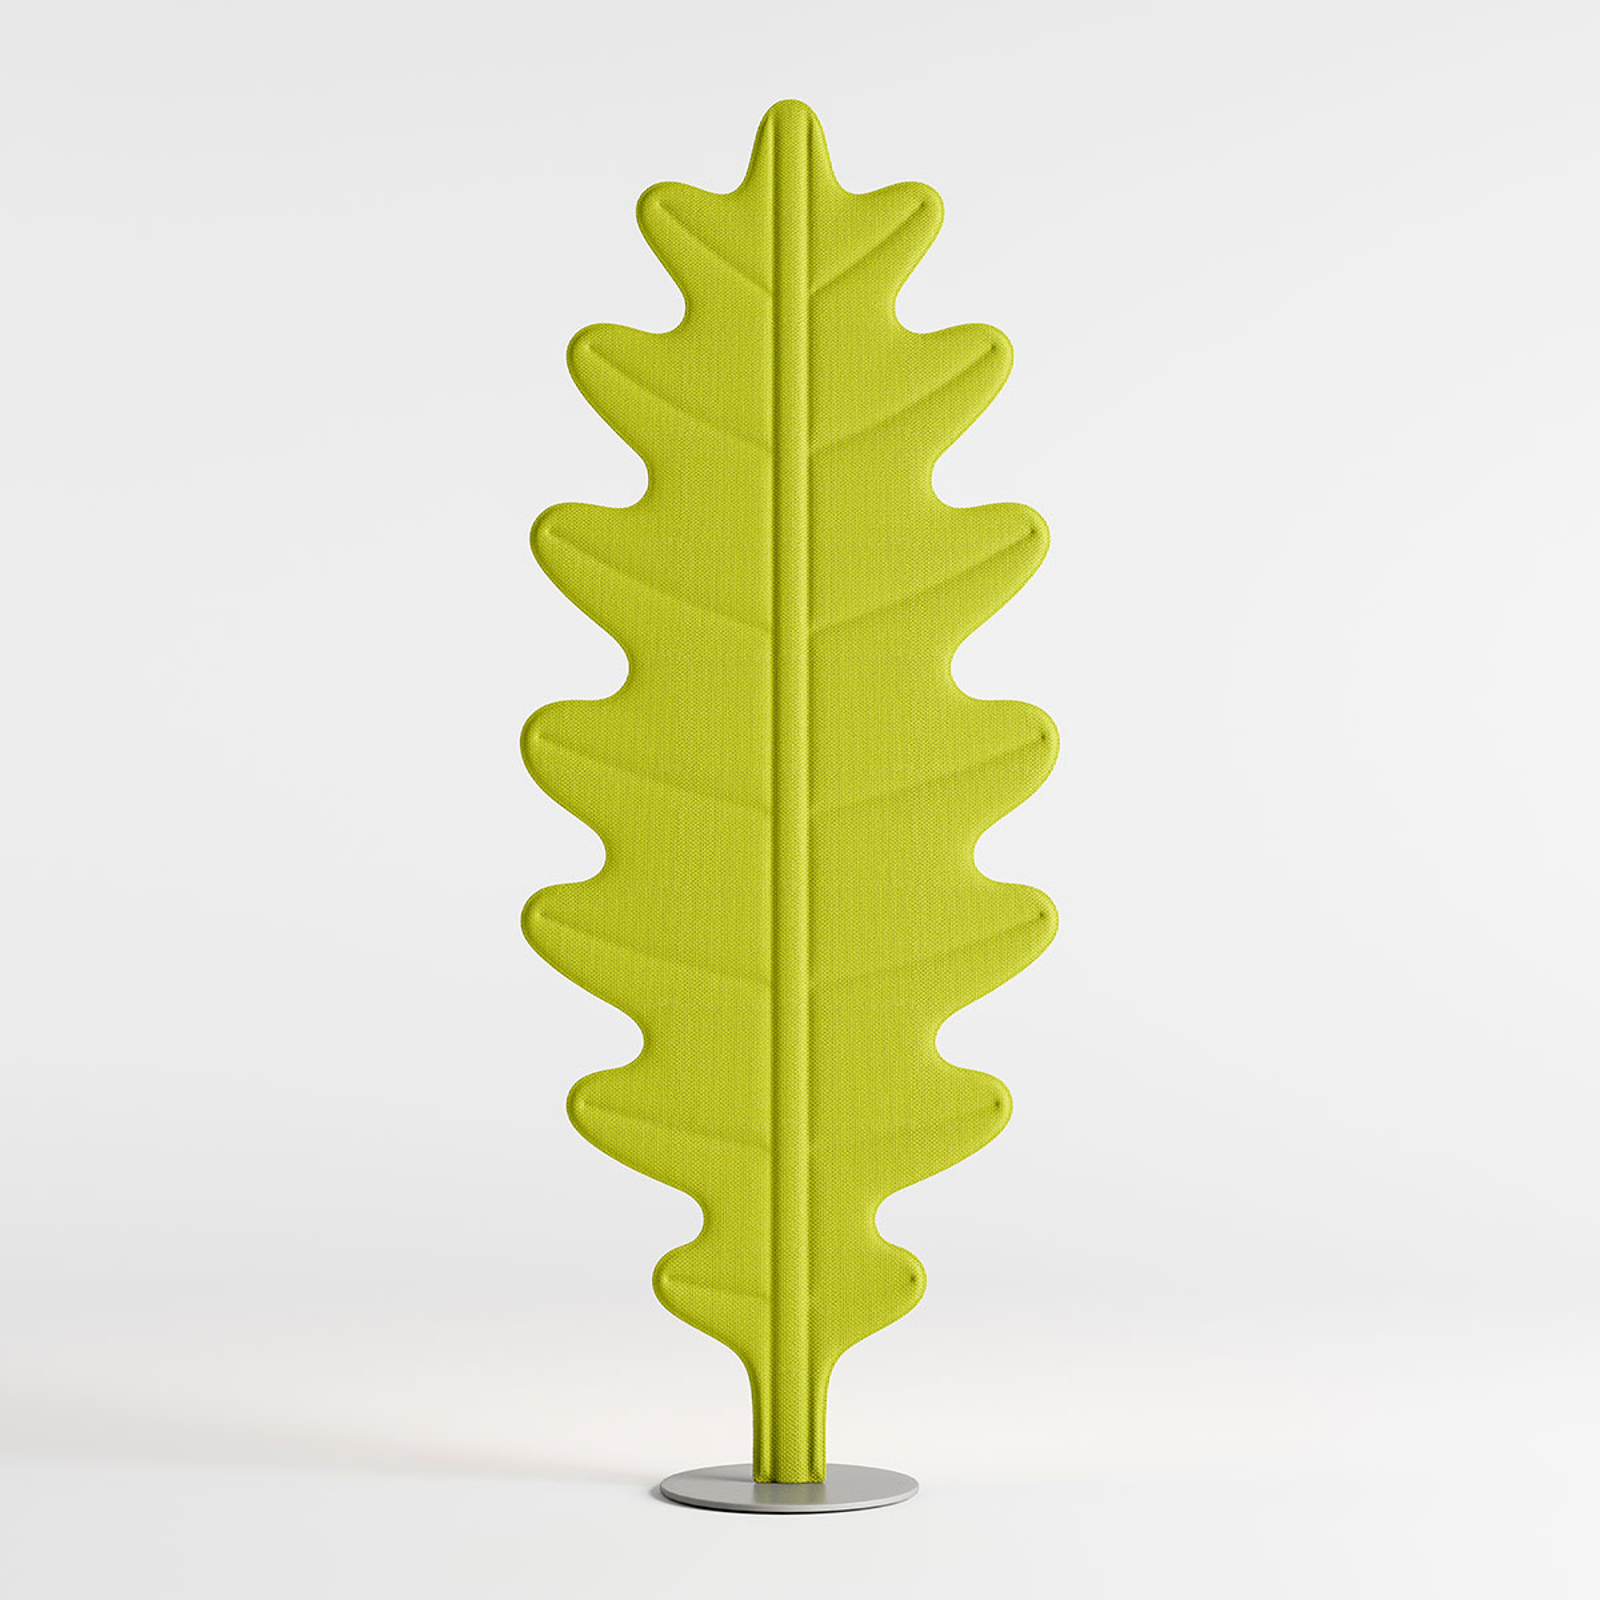 Rotaliana Eden Oak LED-Stehleuchte, hellgrün